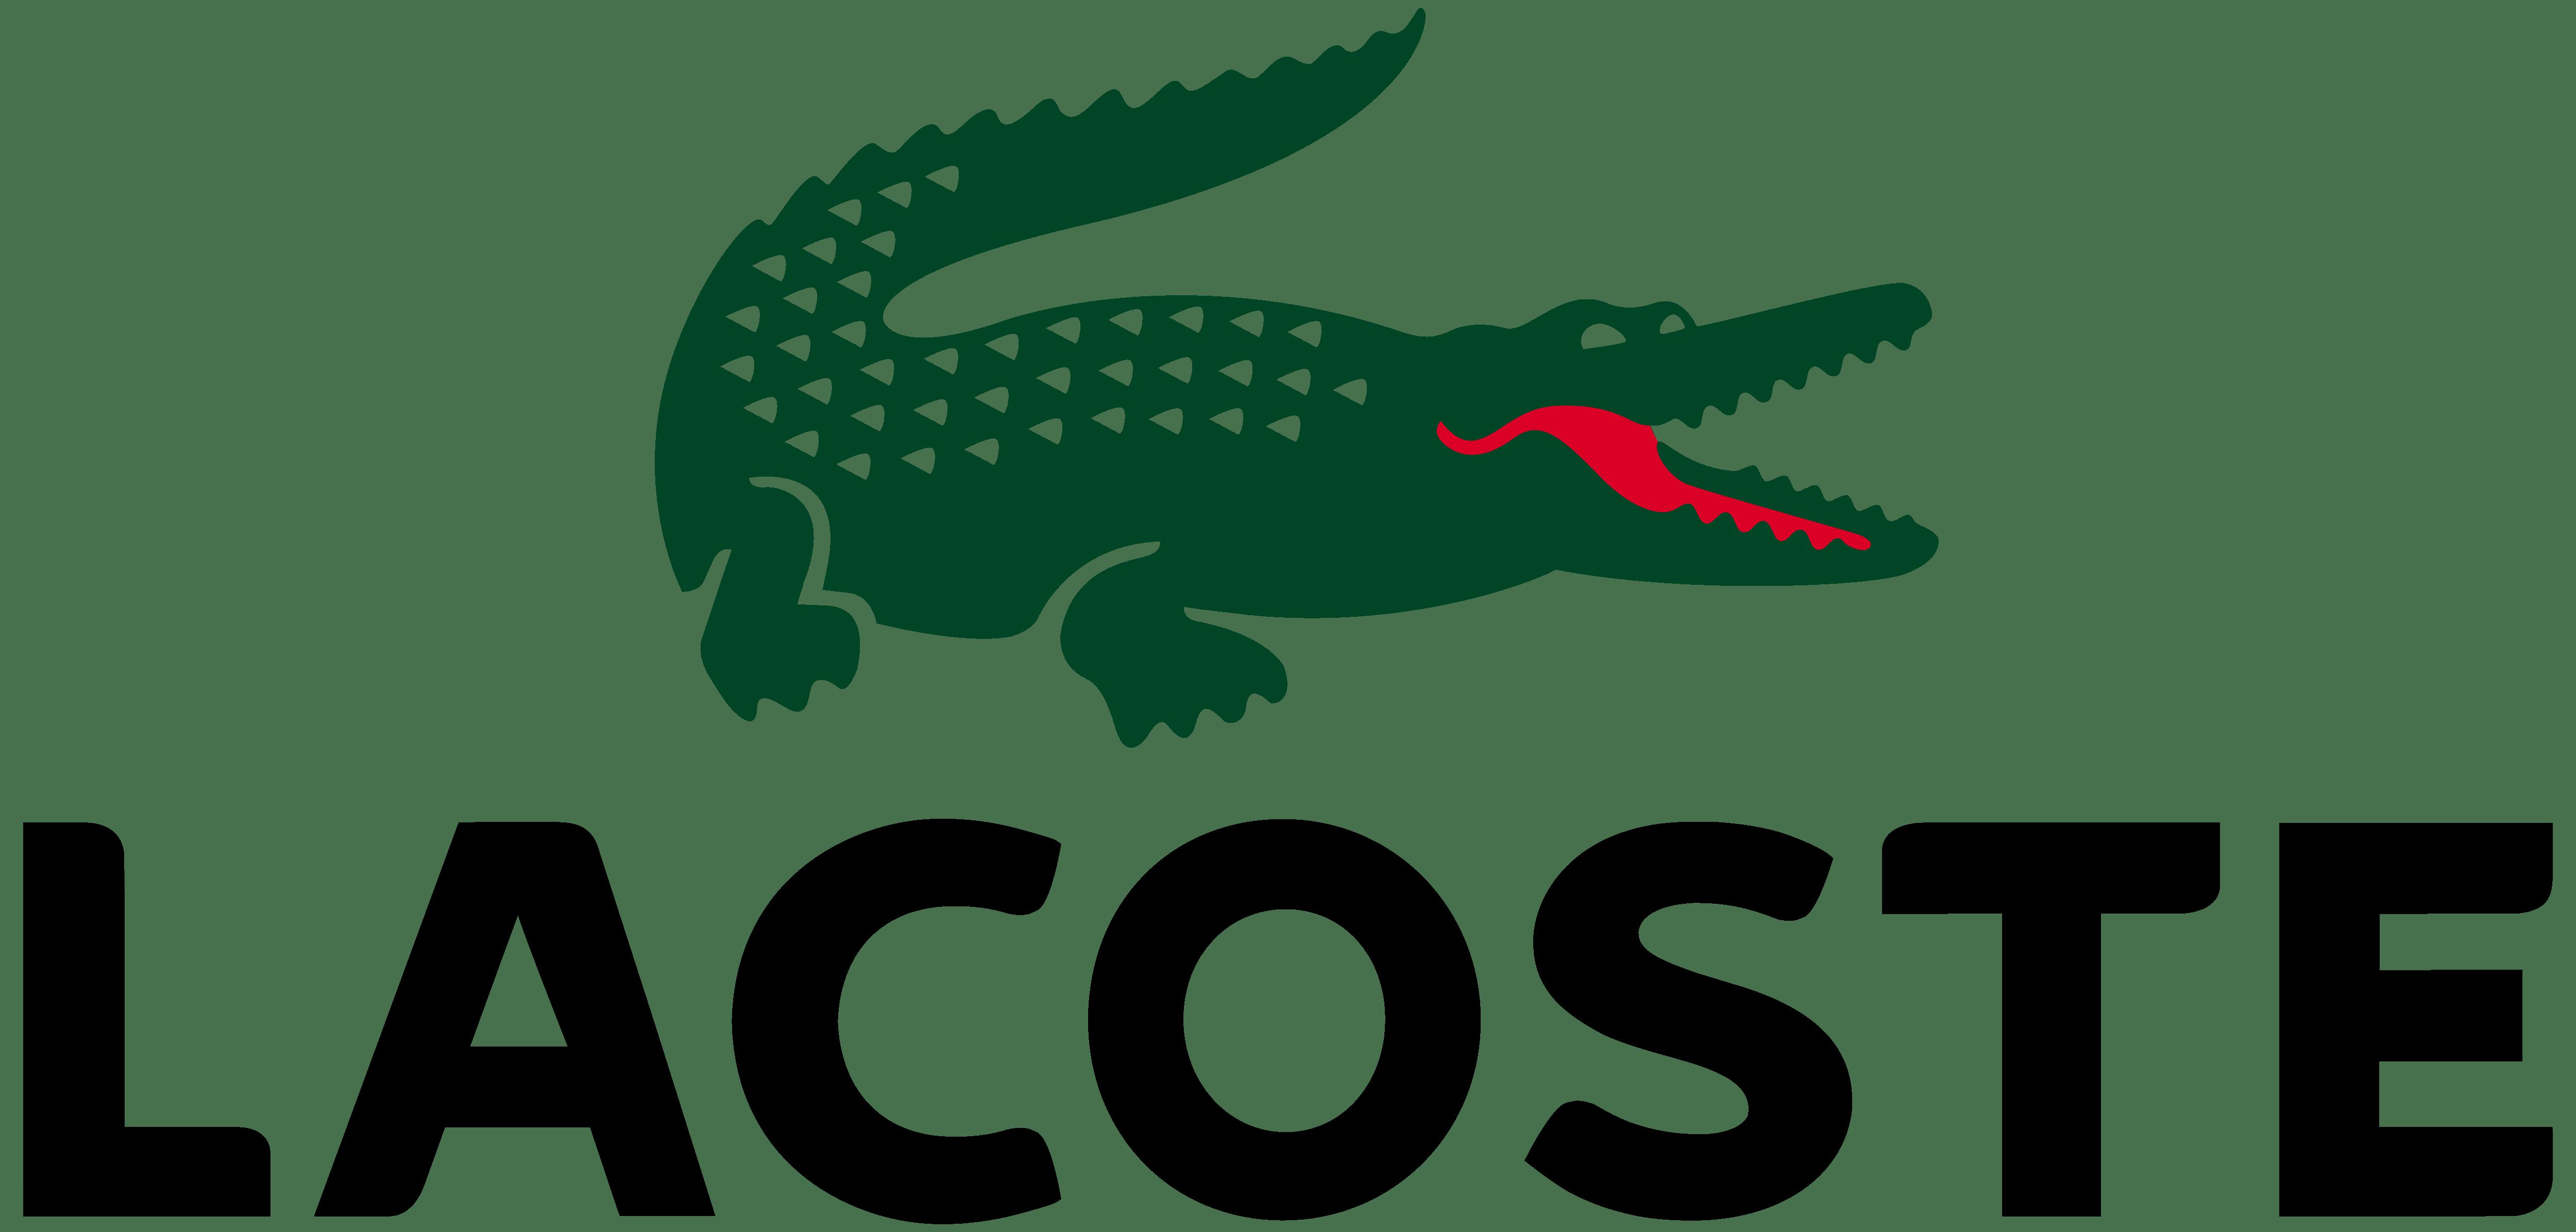 Lacoste Logo Rene Lacoste Lacoste Logo Quiz